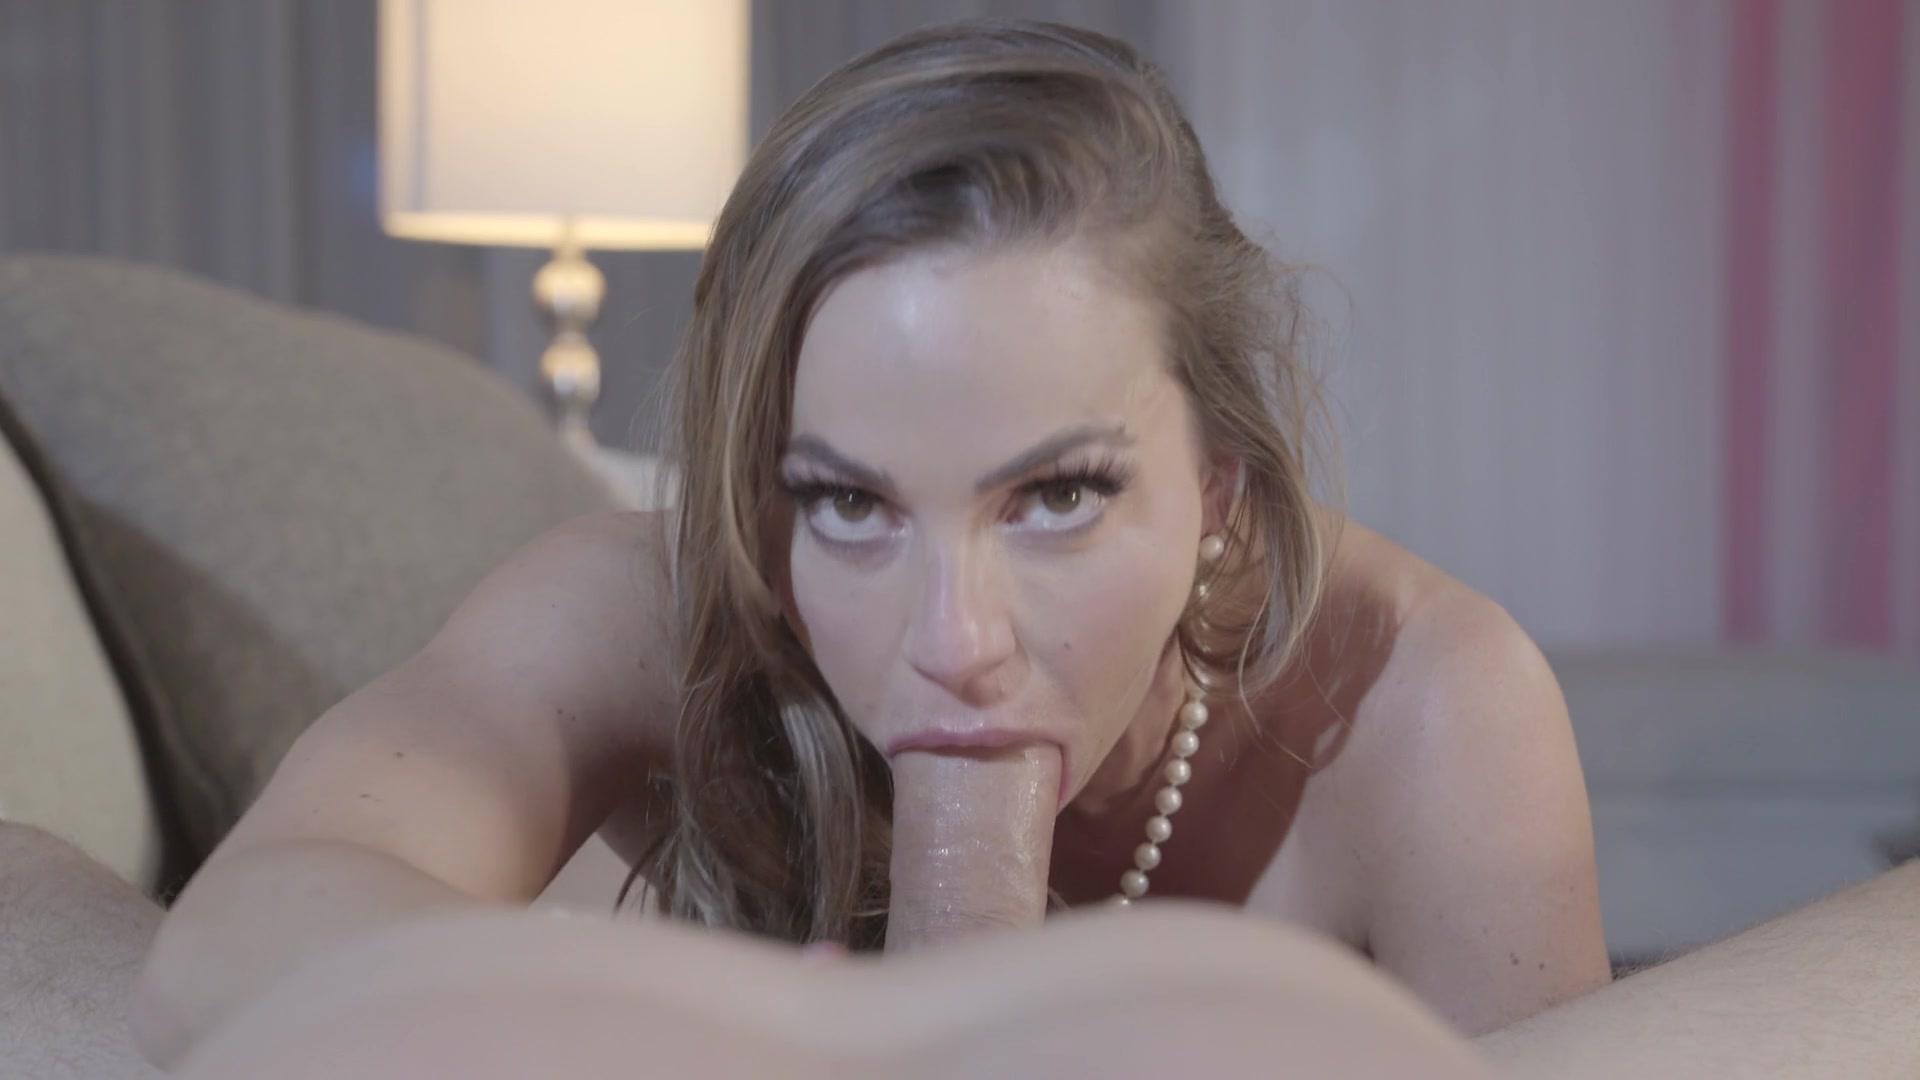 Abigail 93 Porno brazzers mr. & mrs. smith a xxx parody - til assassins do us part (2019)  abigail mac & mick blue